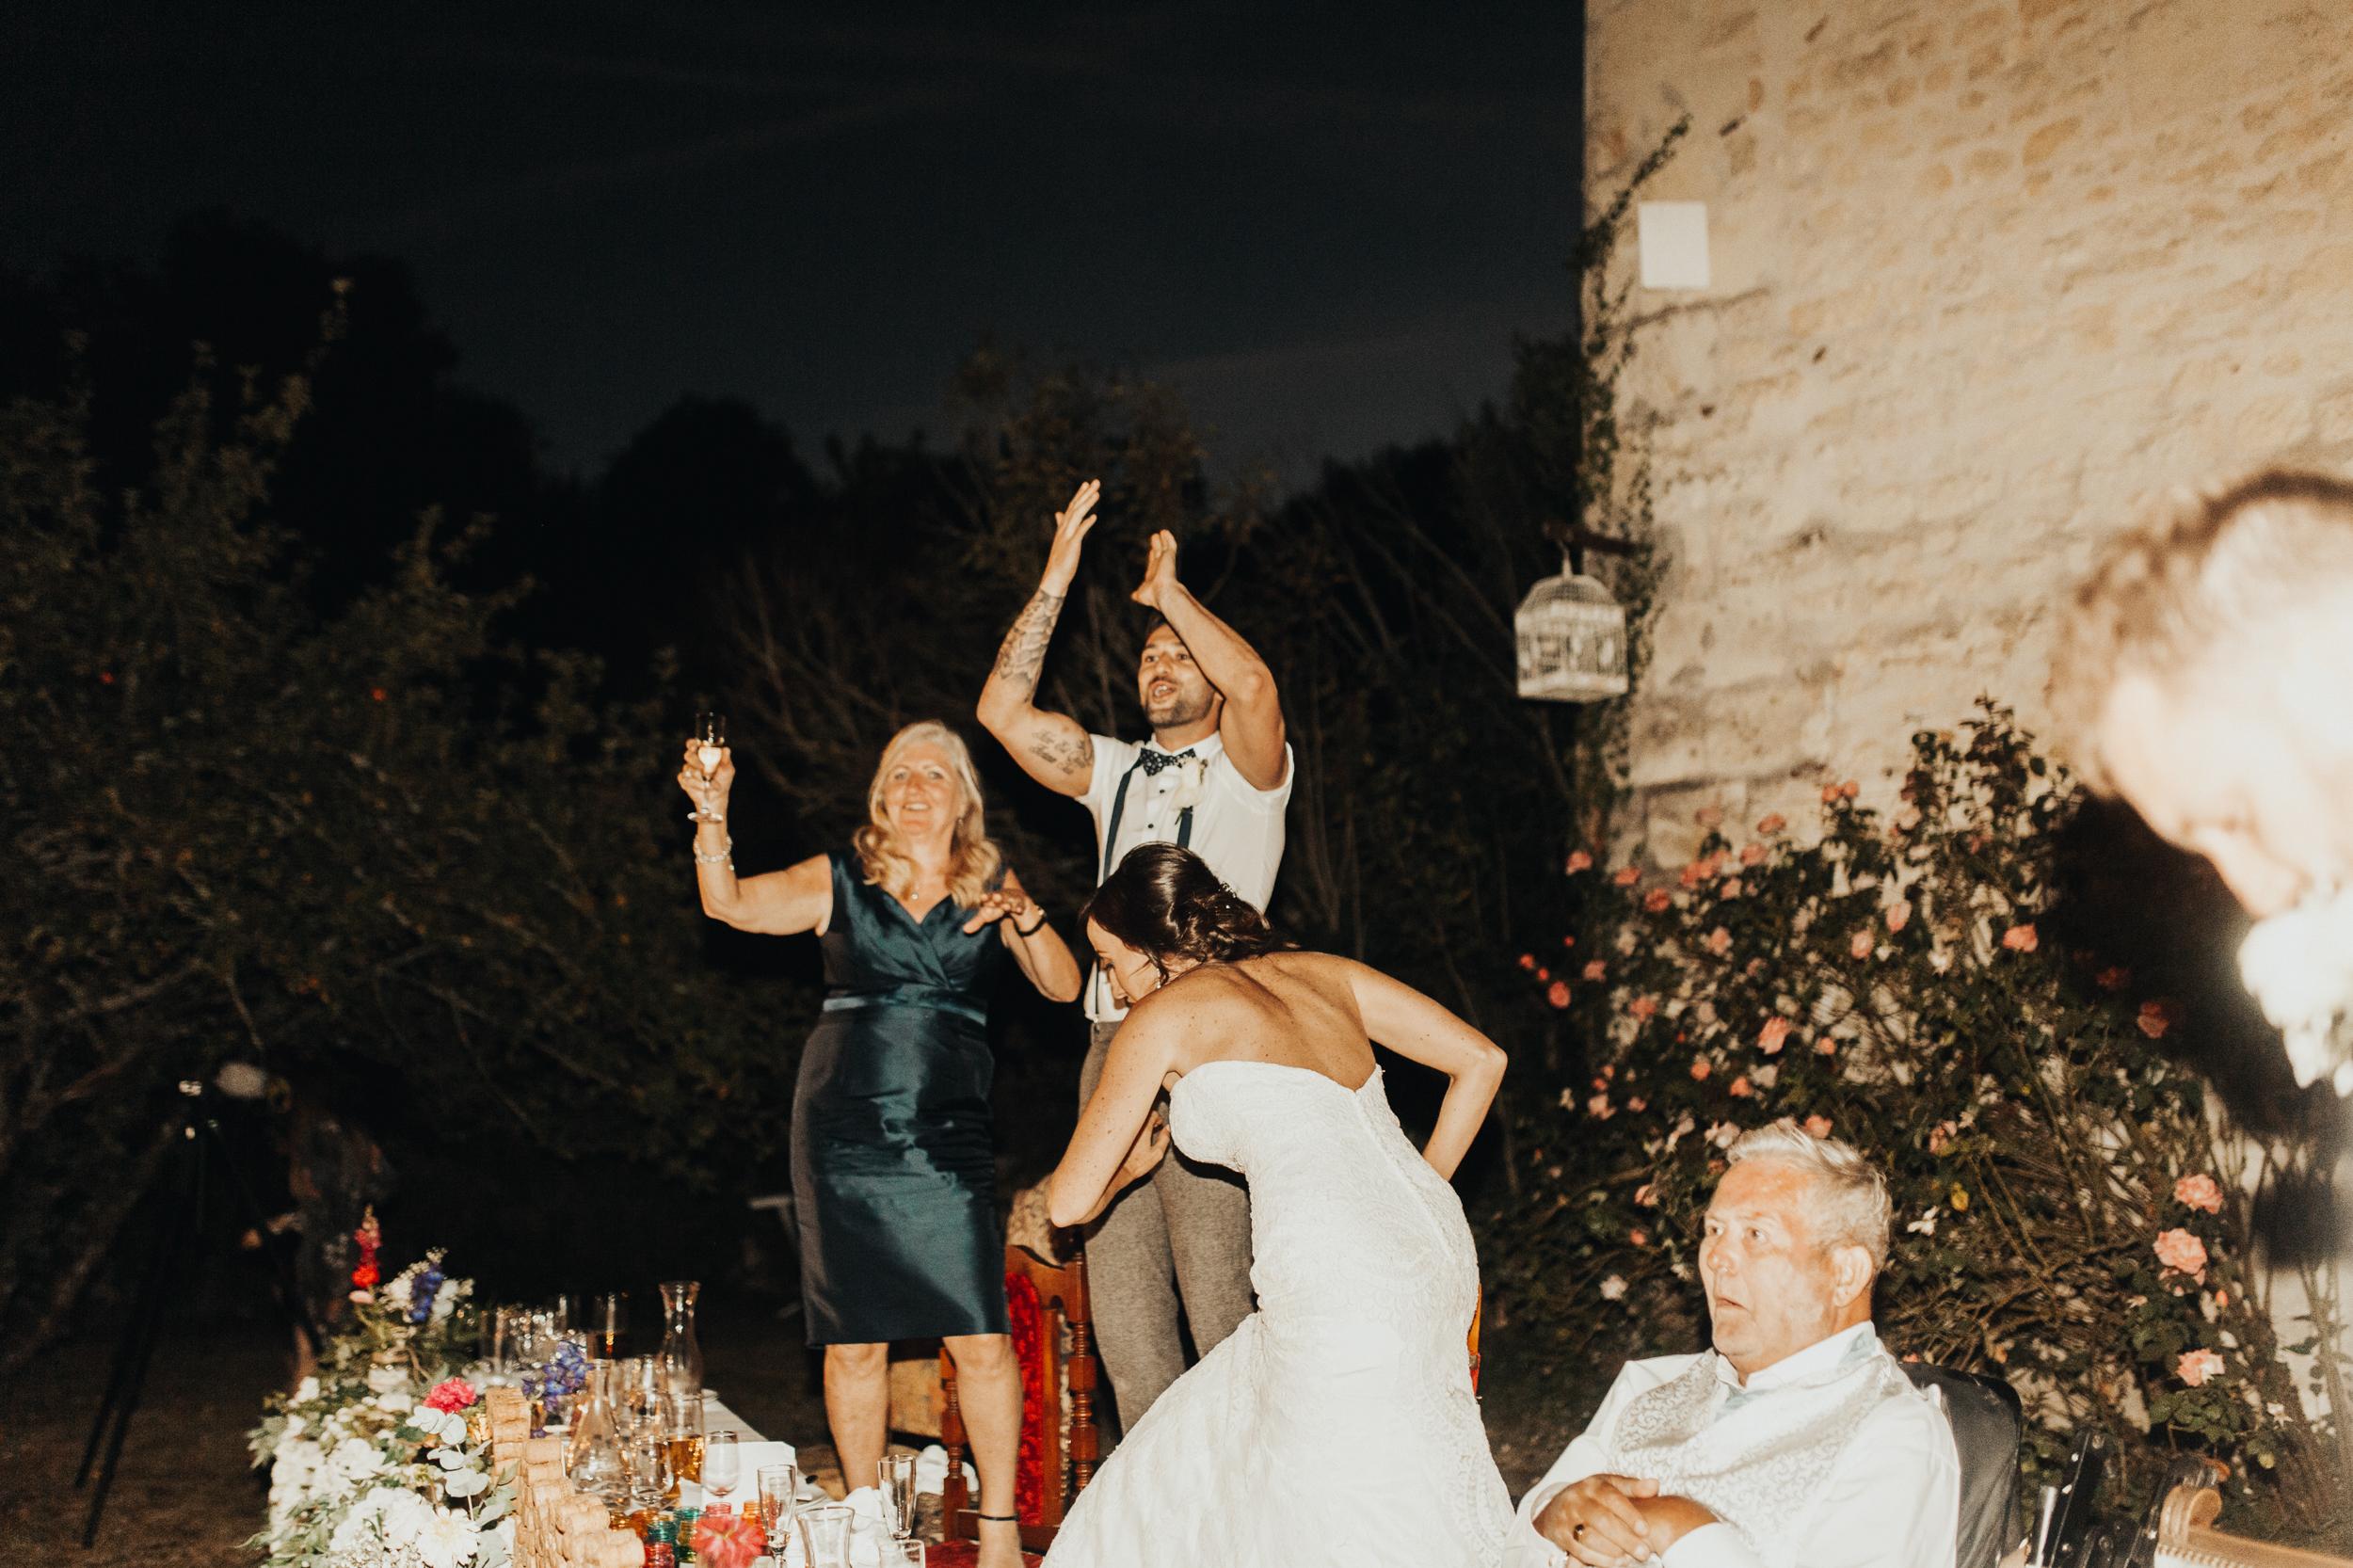 Amy-Zac-Destination-Wedding-France-Manoir-Foulquetiere-Darina-Stoda-Photography-106.jpg